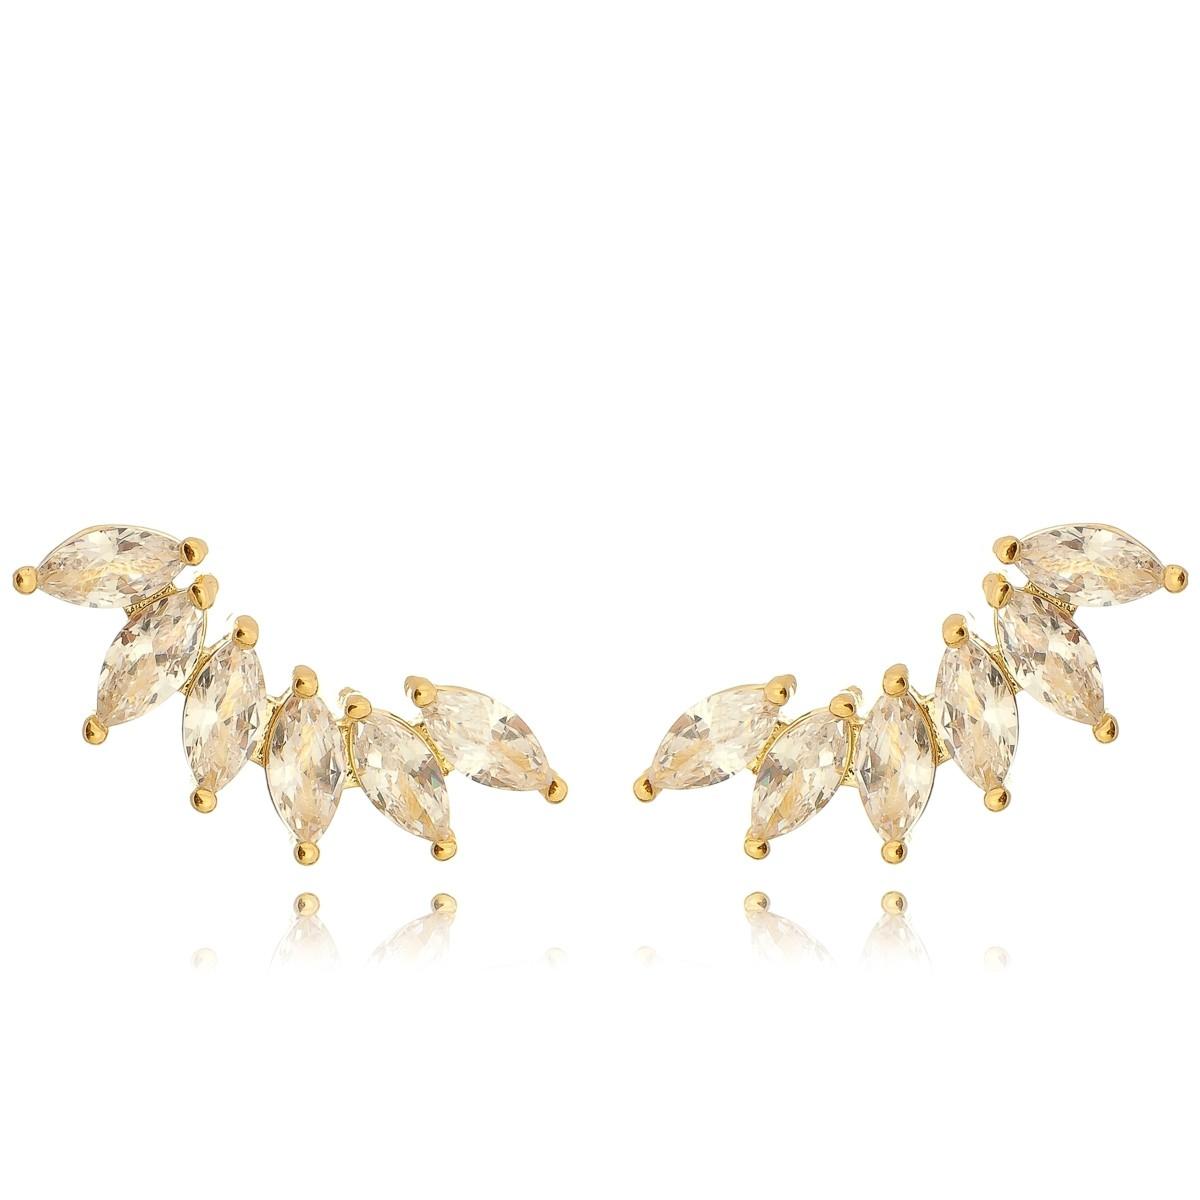 Brinco da Moda Ear Cuff Navete Semijoia em Ouro 18K com Zircônia Branca Brilhante  - Soloyou